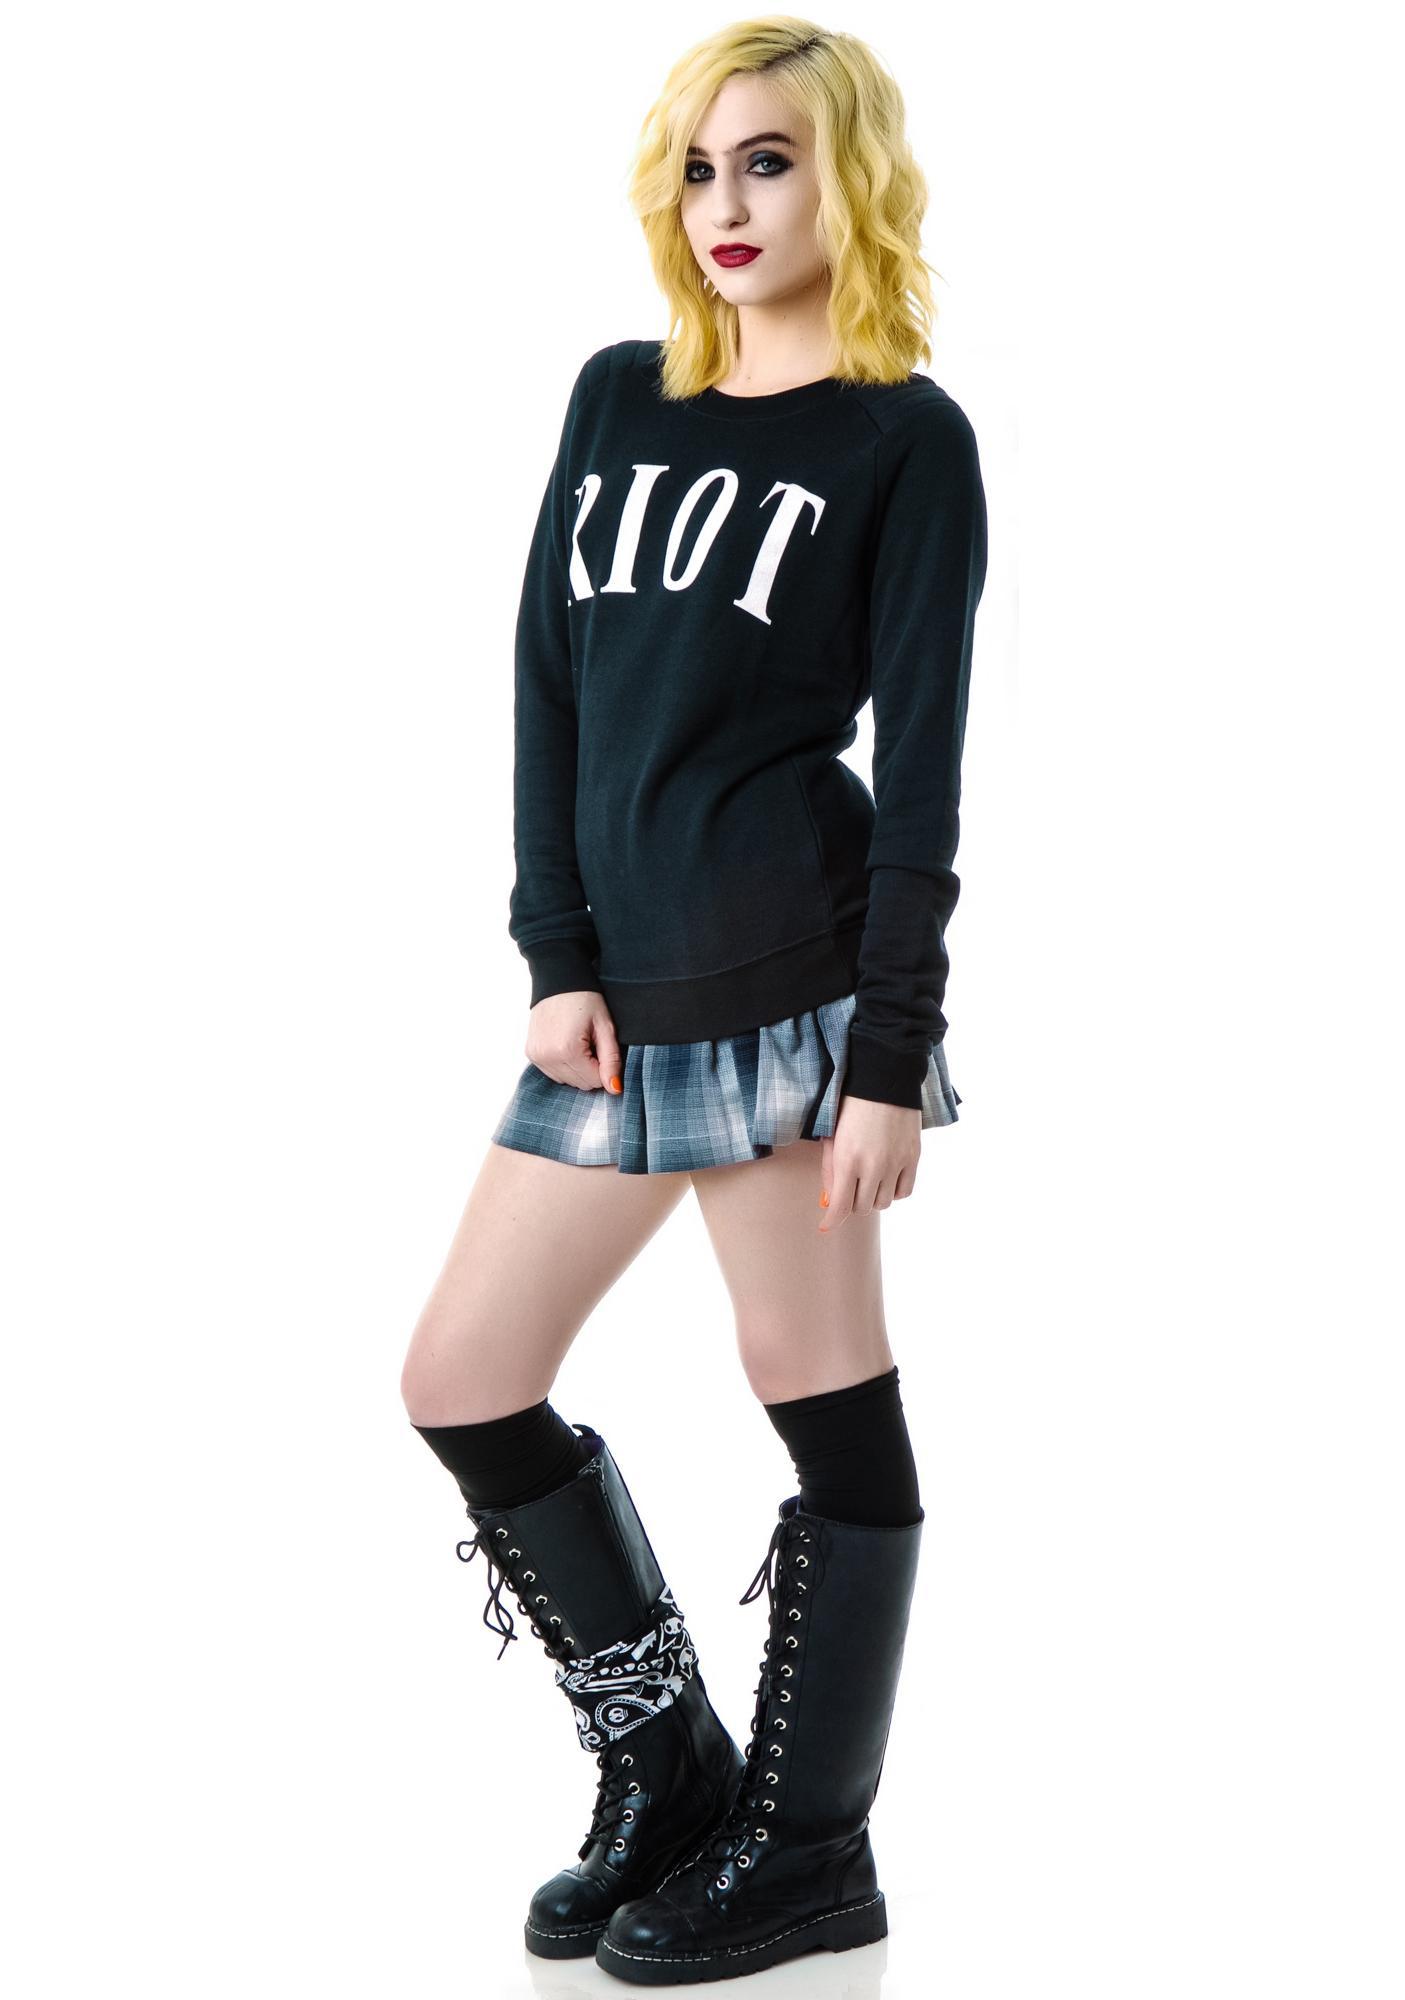 Zoe Karssen Riot Sweater